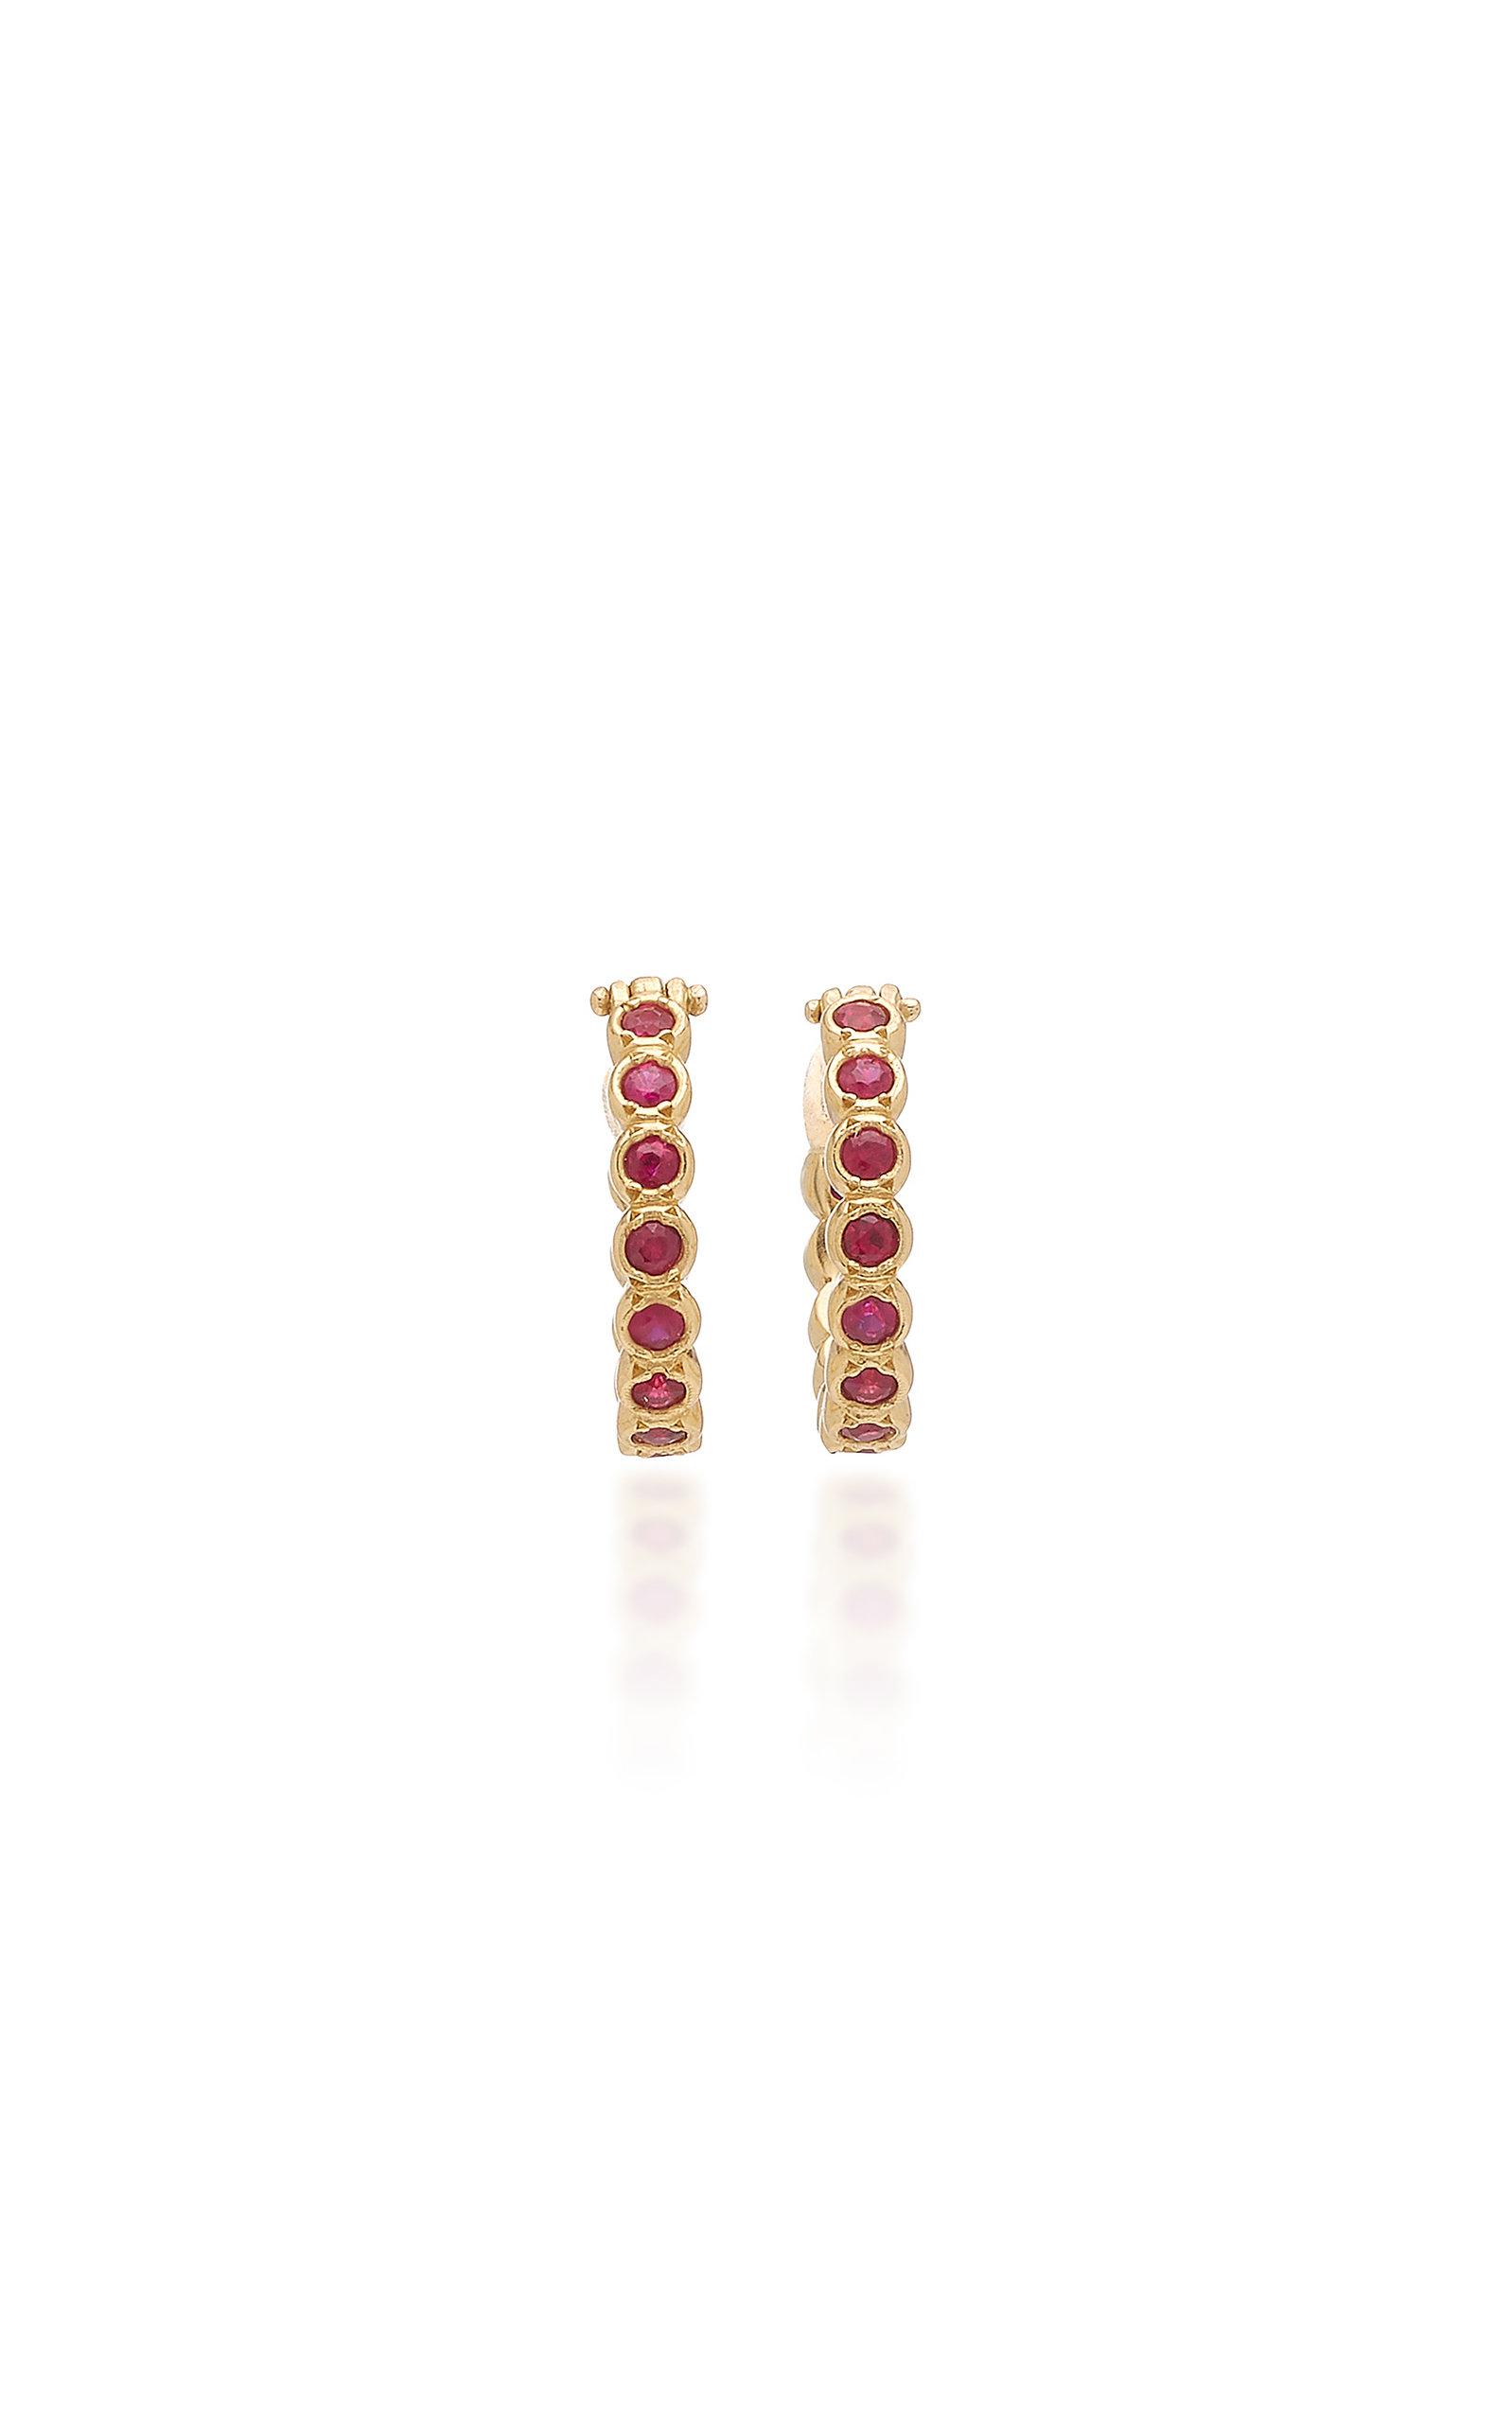 18e757832 Octavia ElizabethChloe Ruby and 18K Gold Hoop Earrings. CLOSE. Loading.  Loading